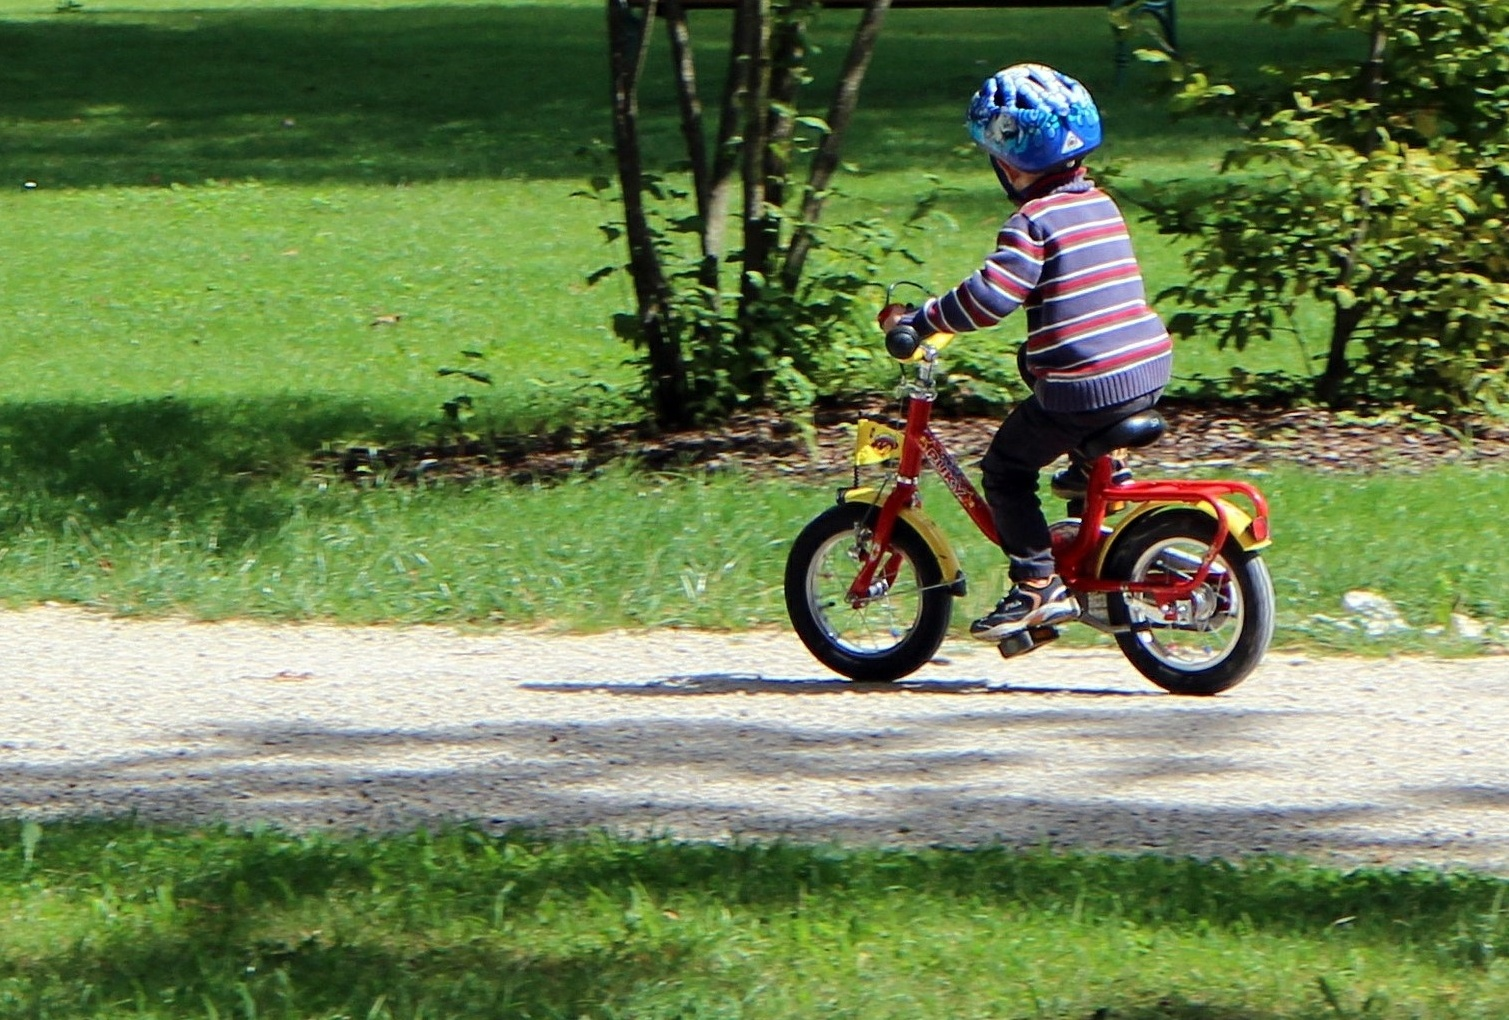 child-427257_1920 (2)-735236-edited.jpg